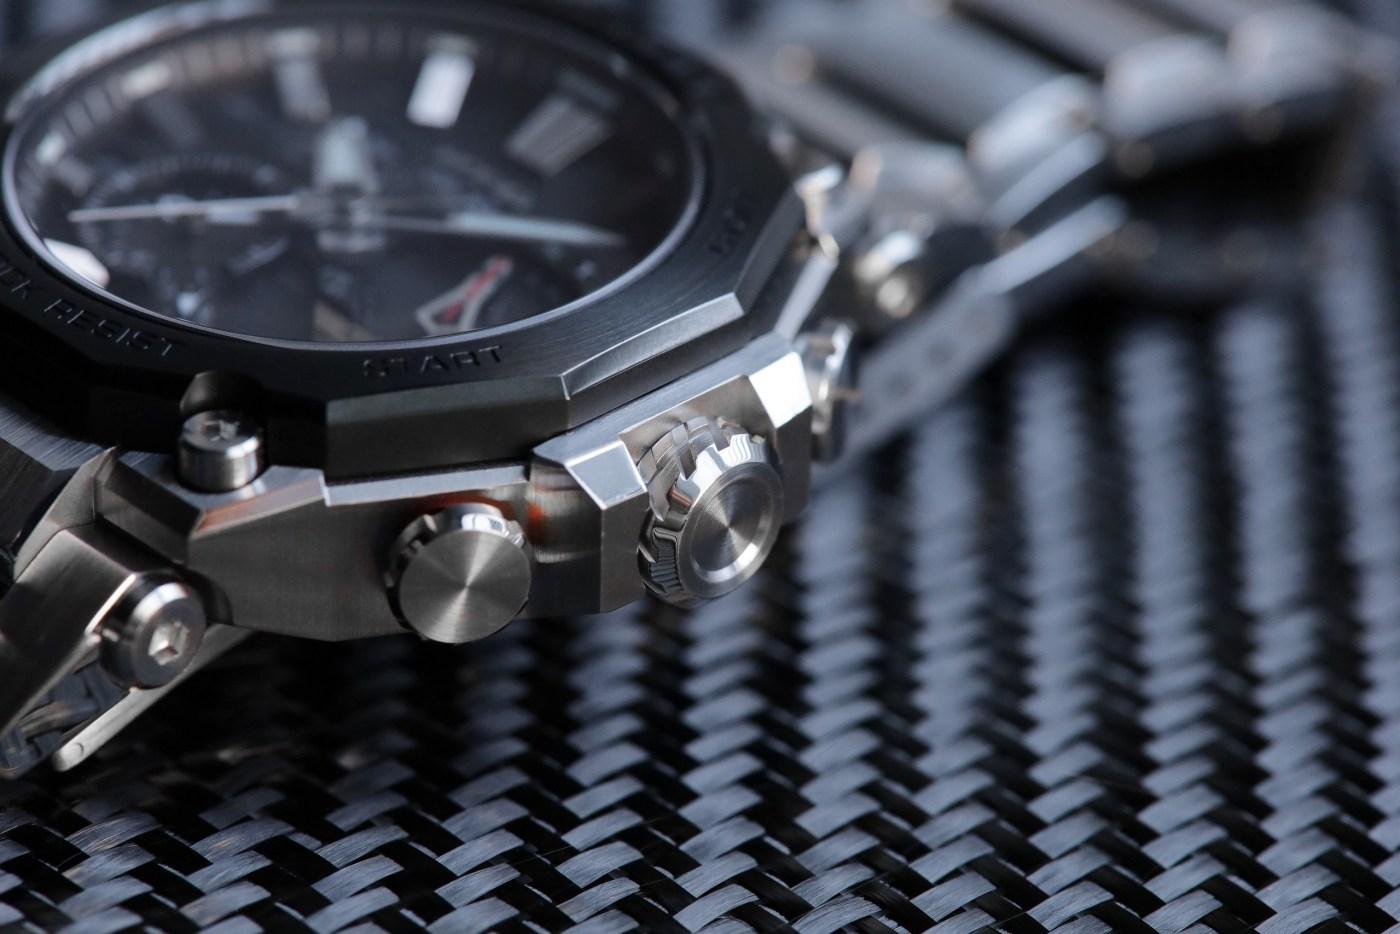 G-Shock MT-G MTGB2000D-1A detail